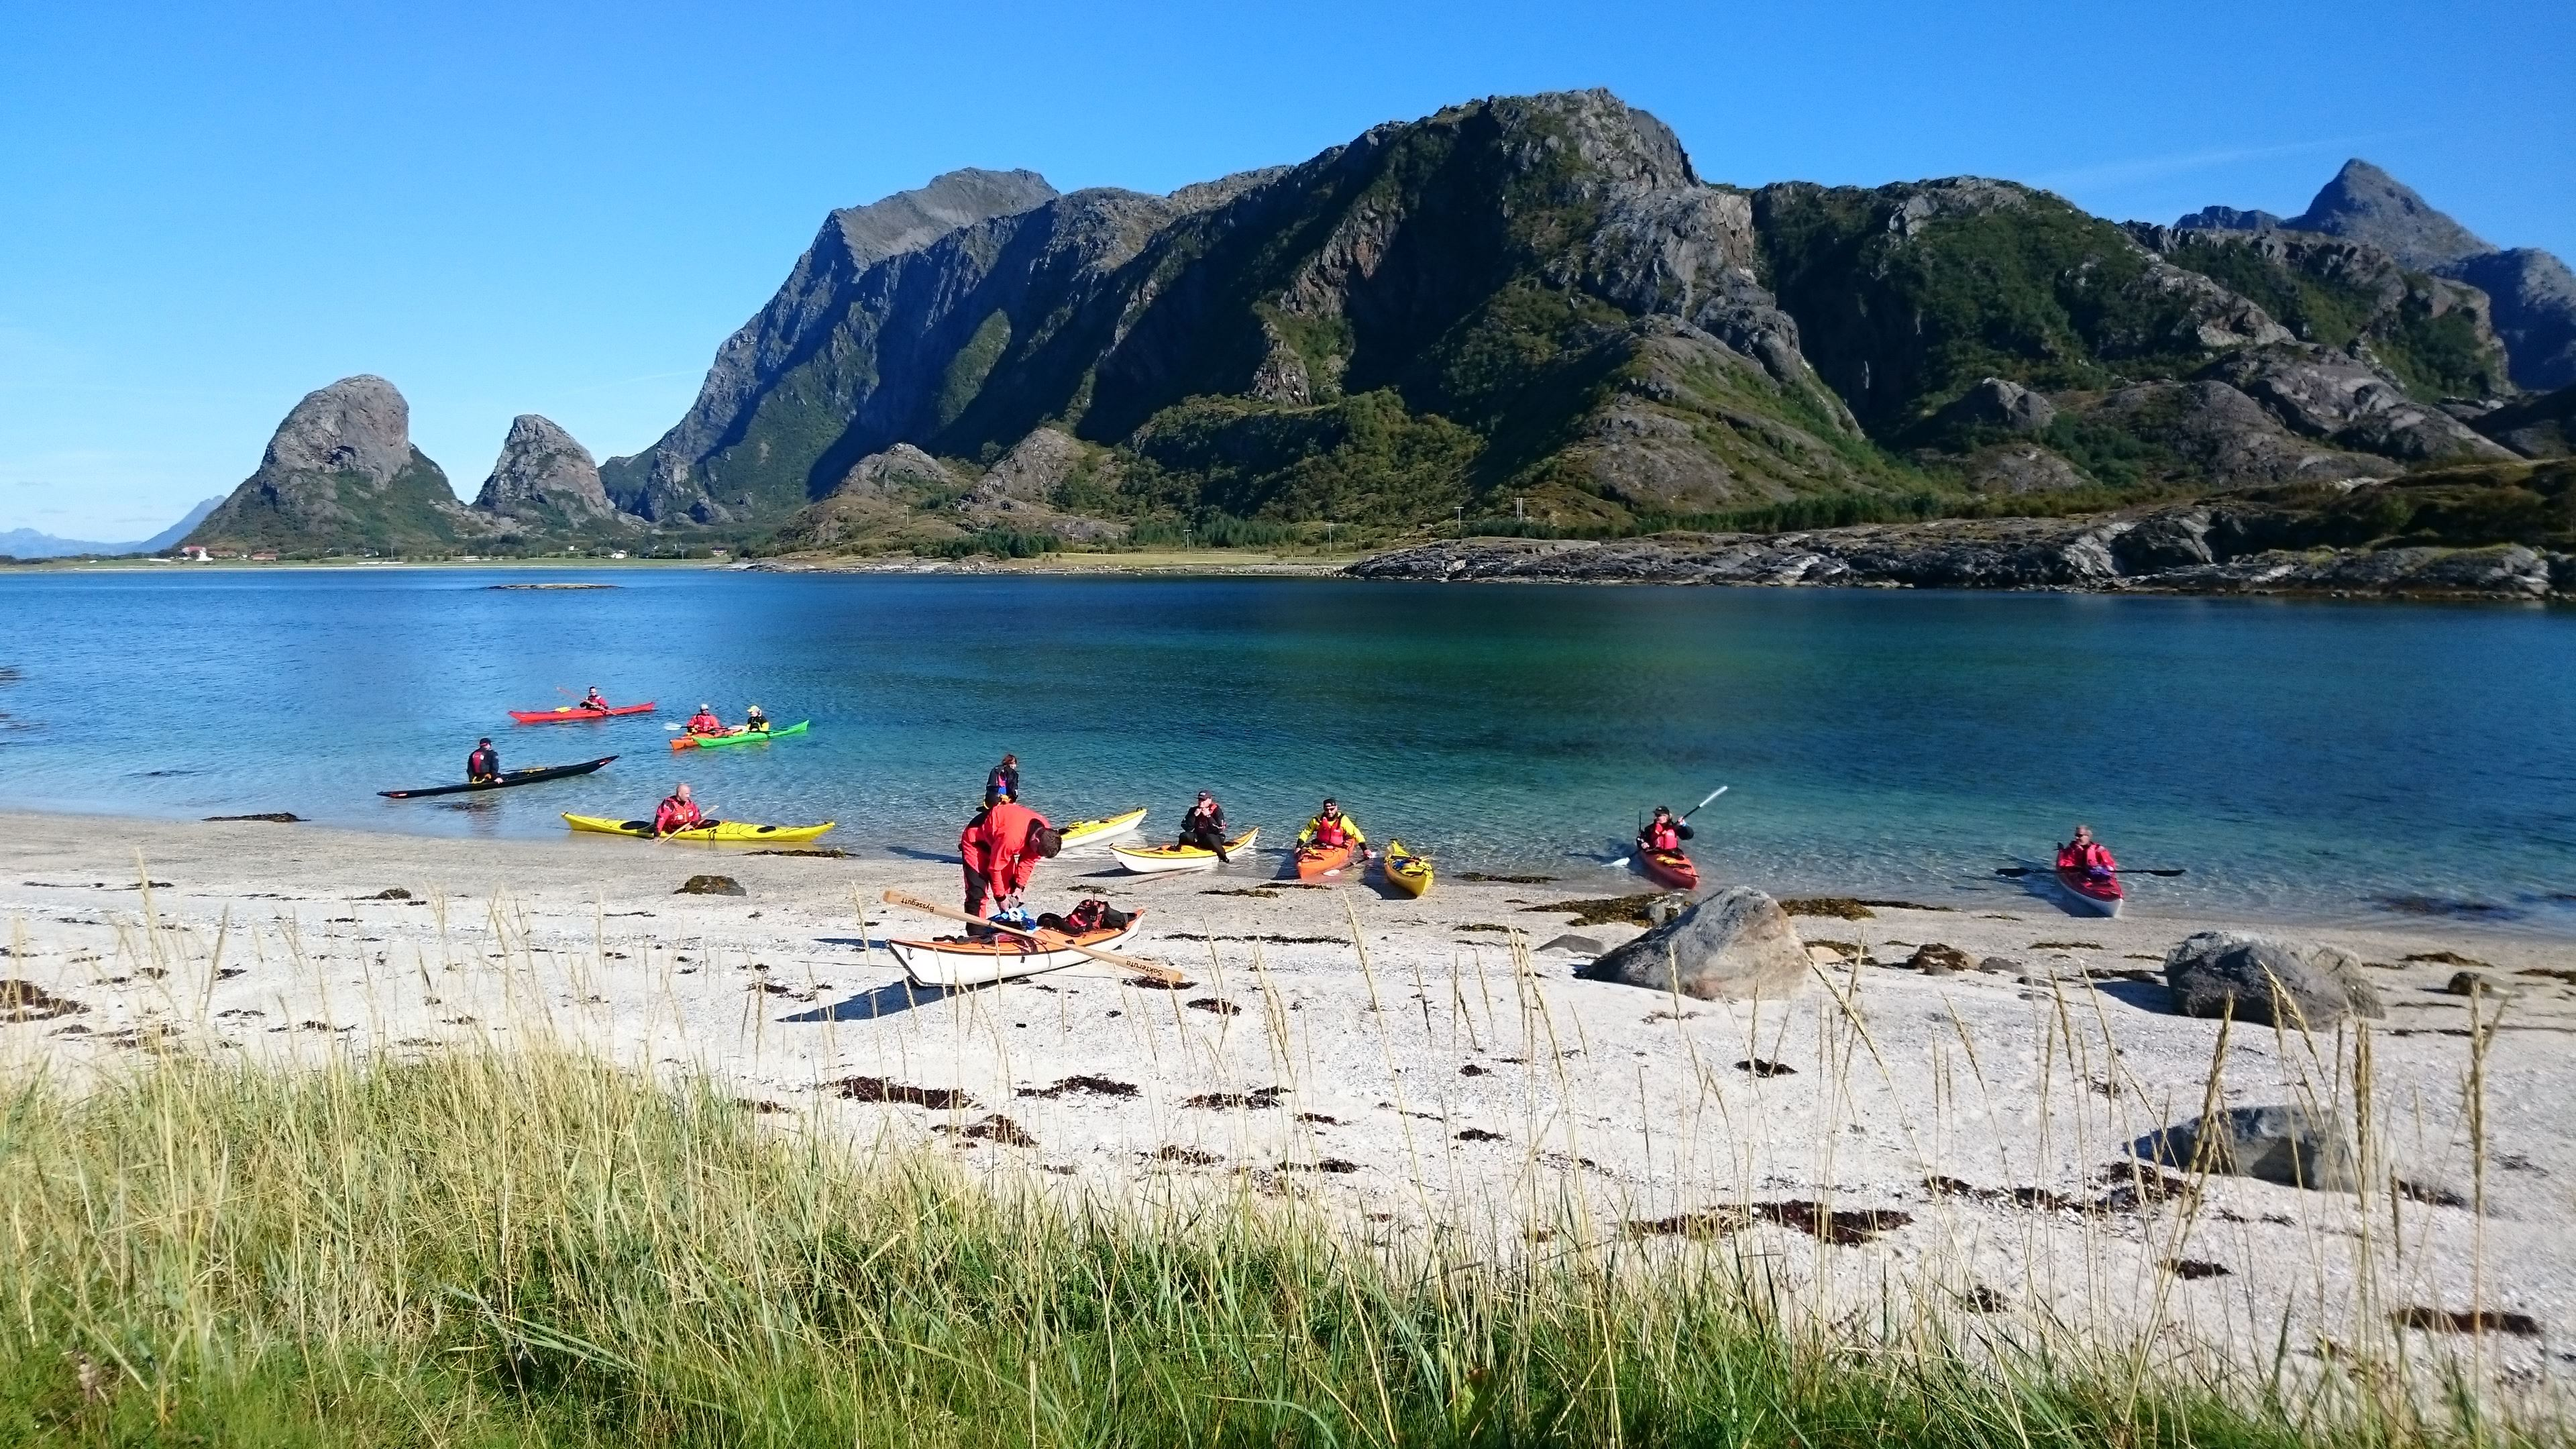 Guided 3-hour kayaktrip